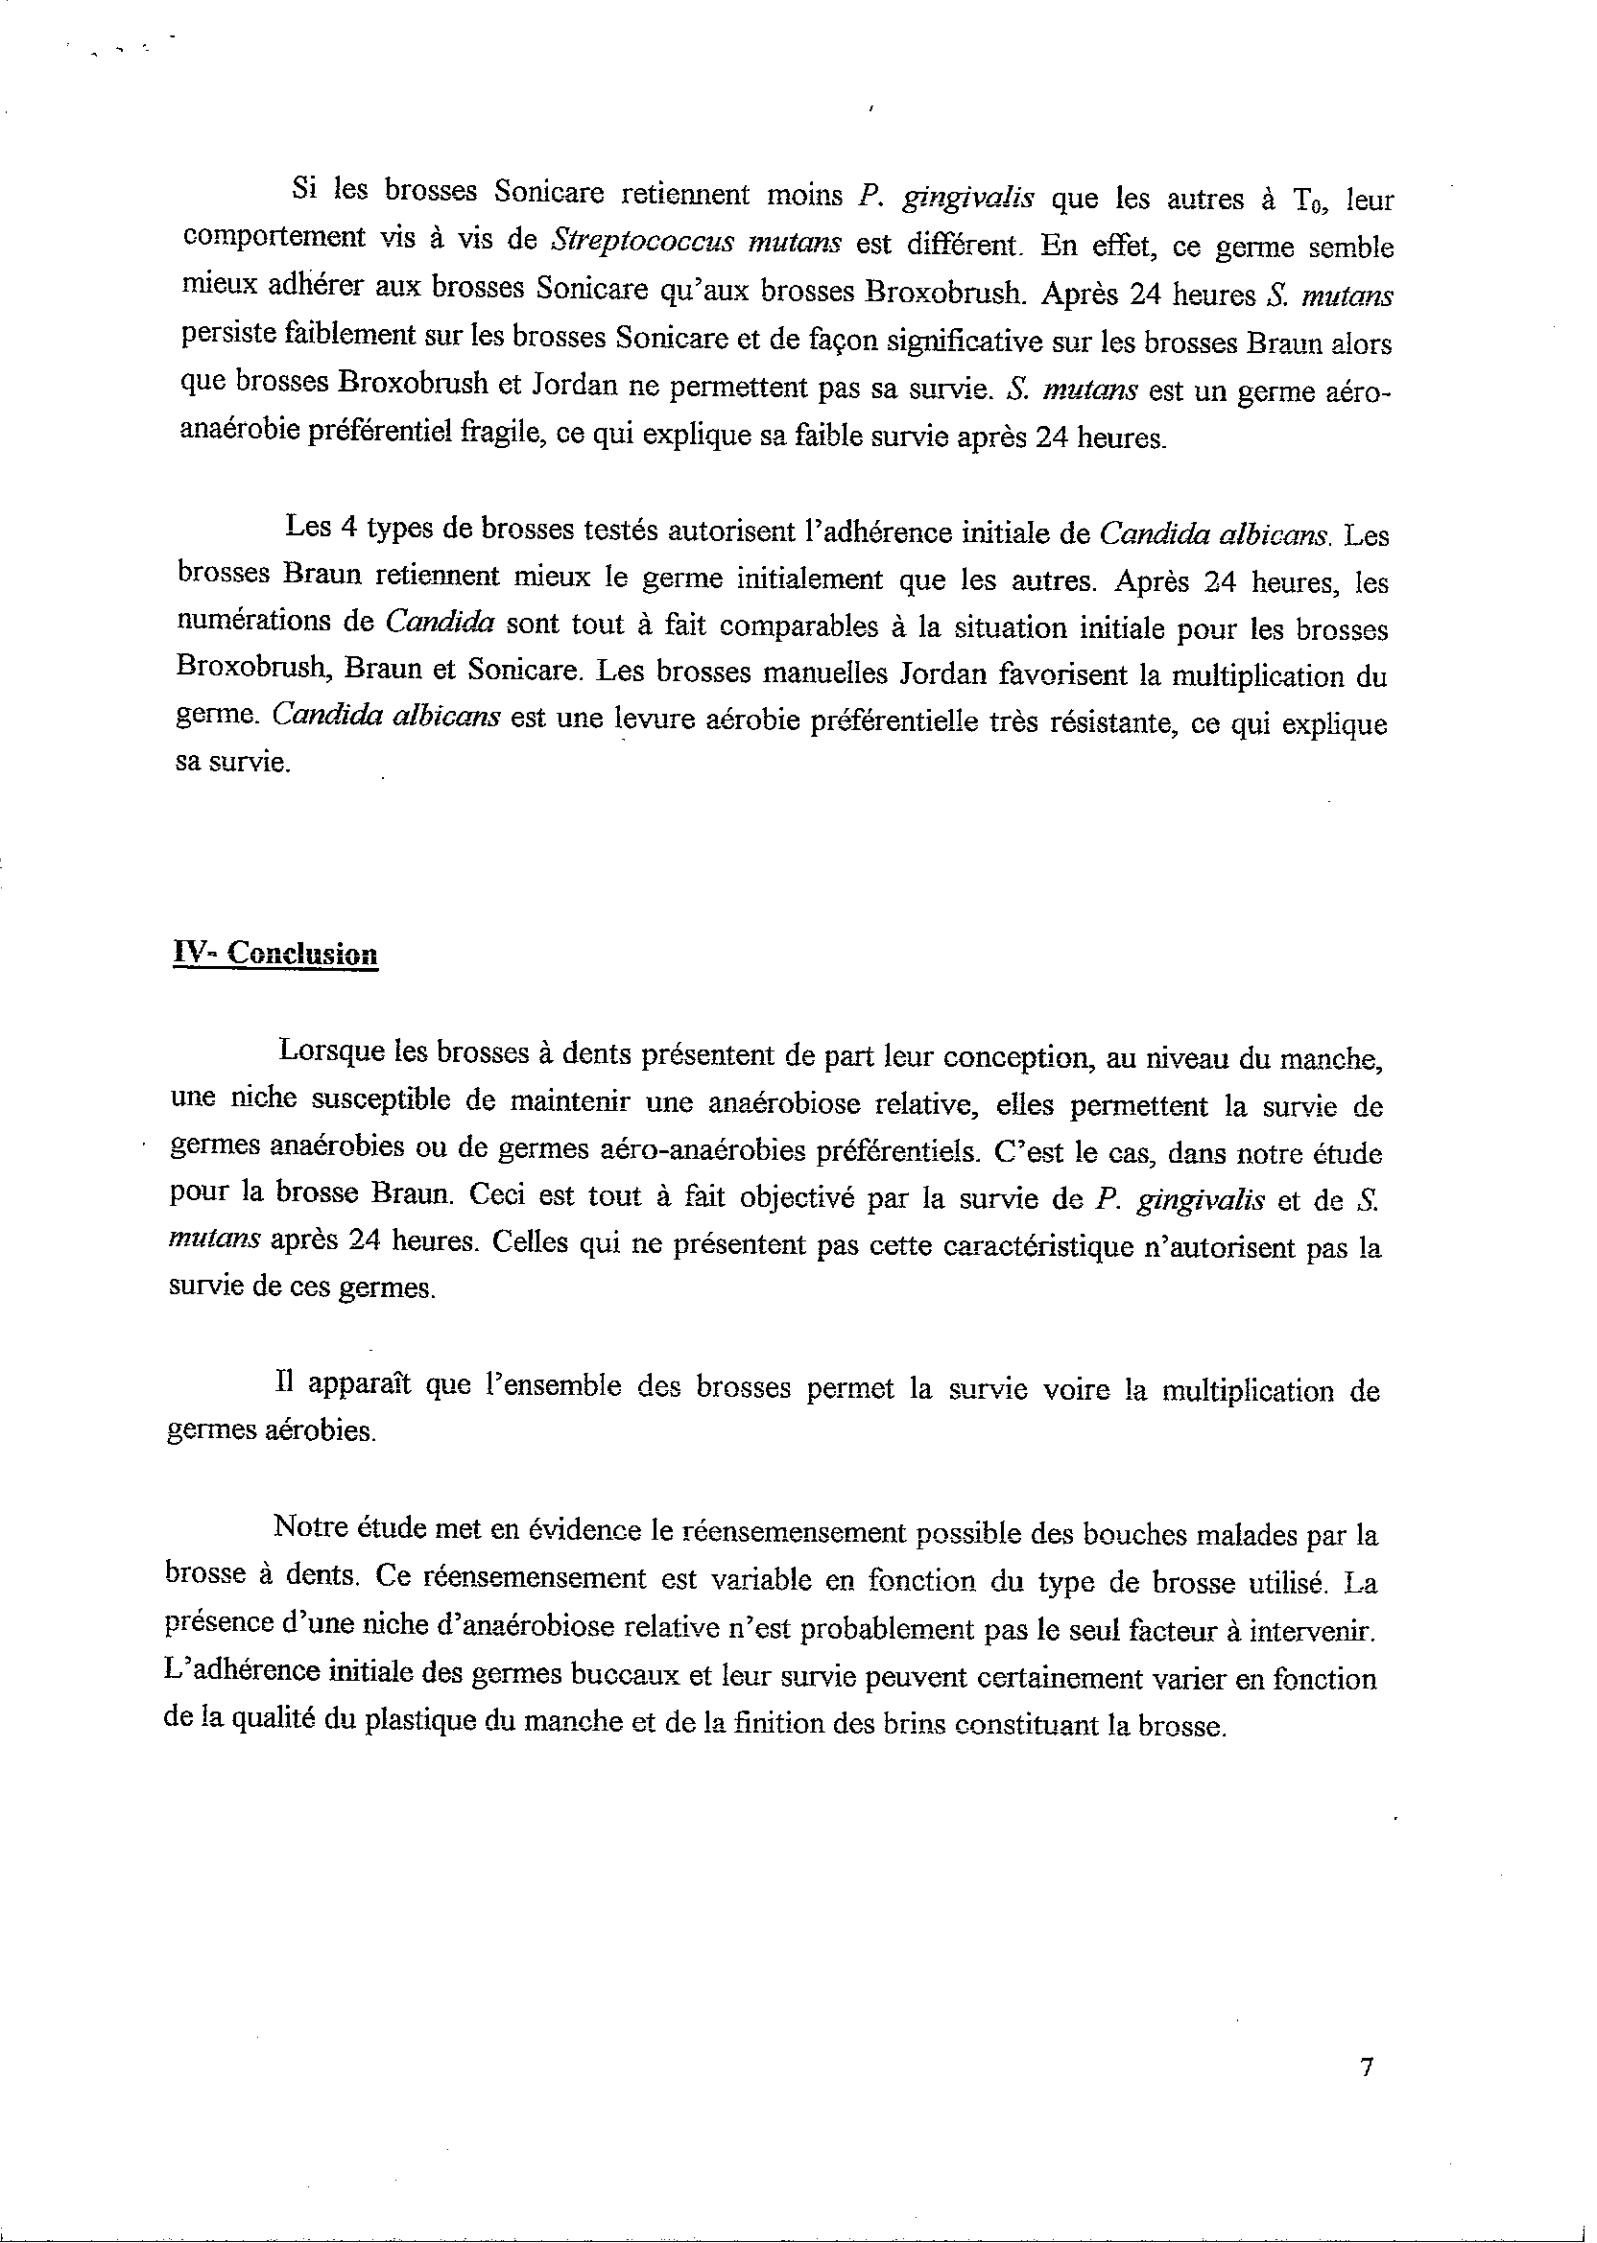 Etude6-page8